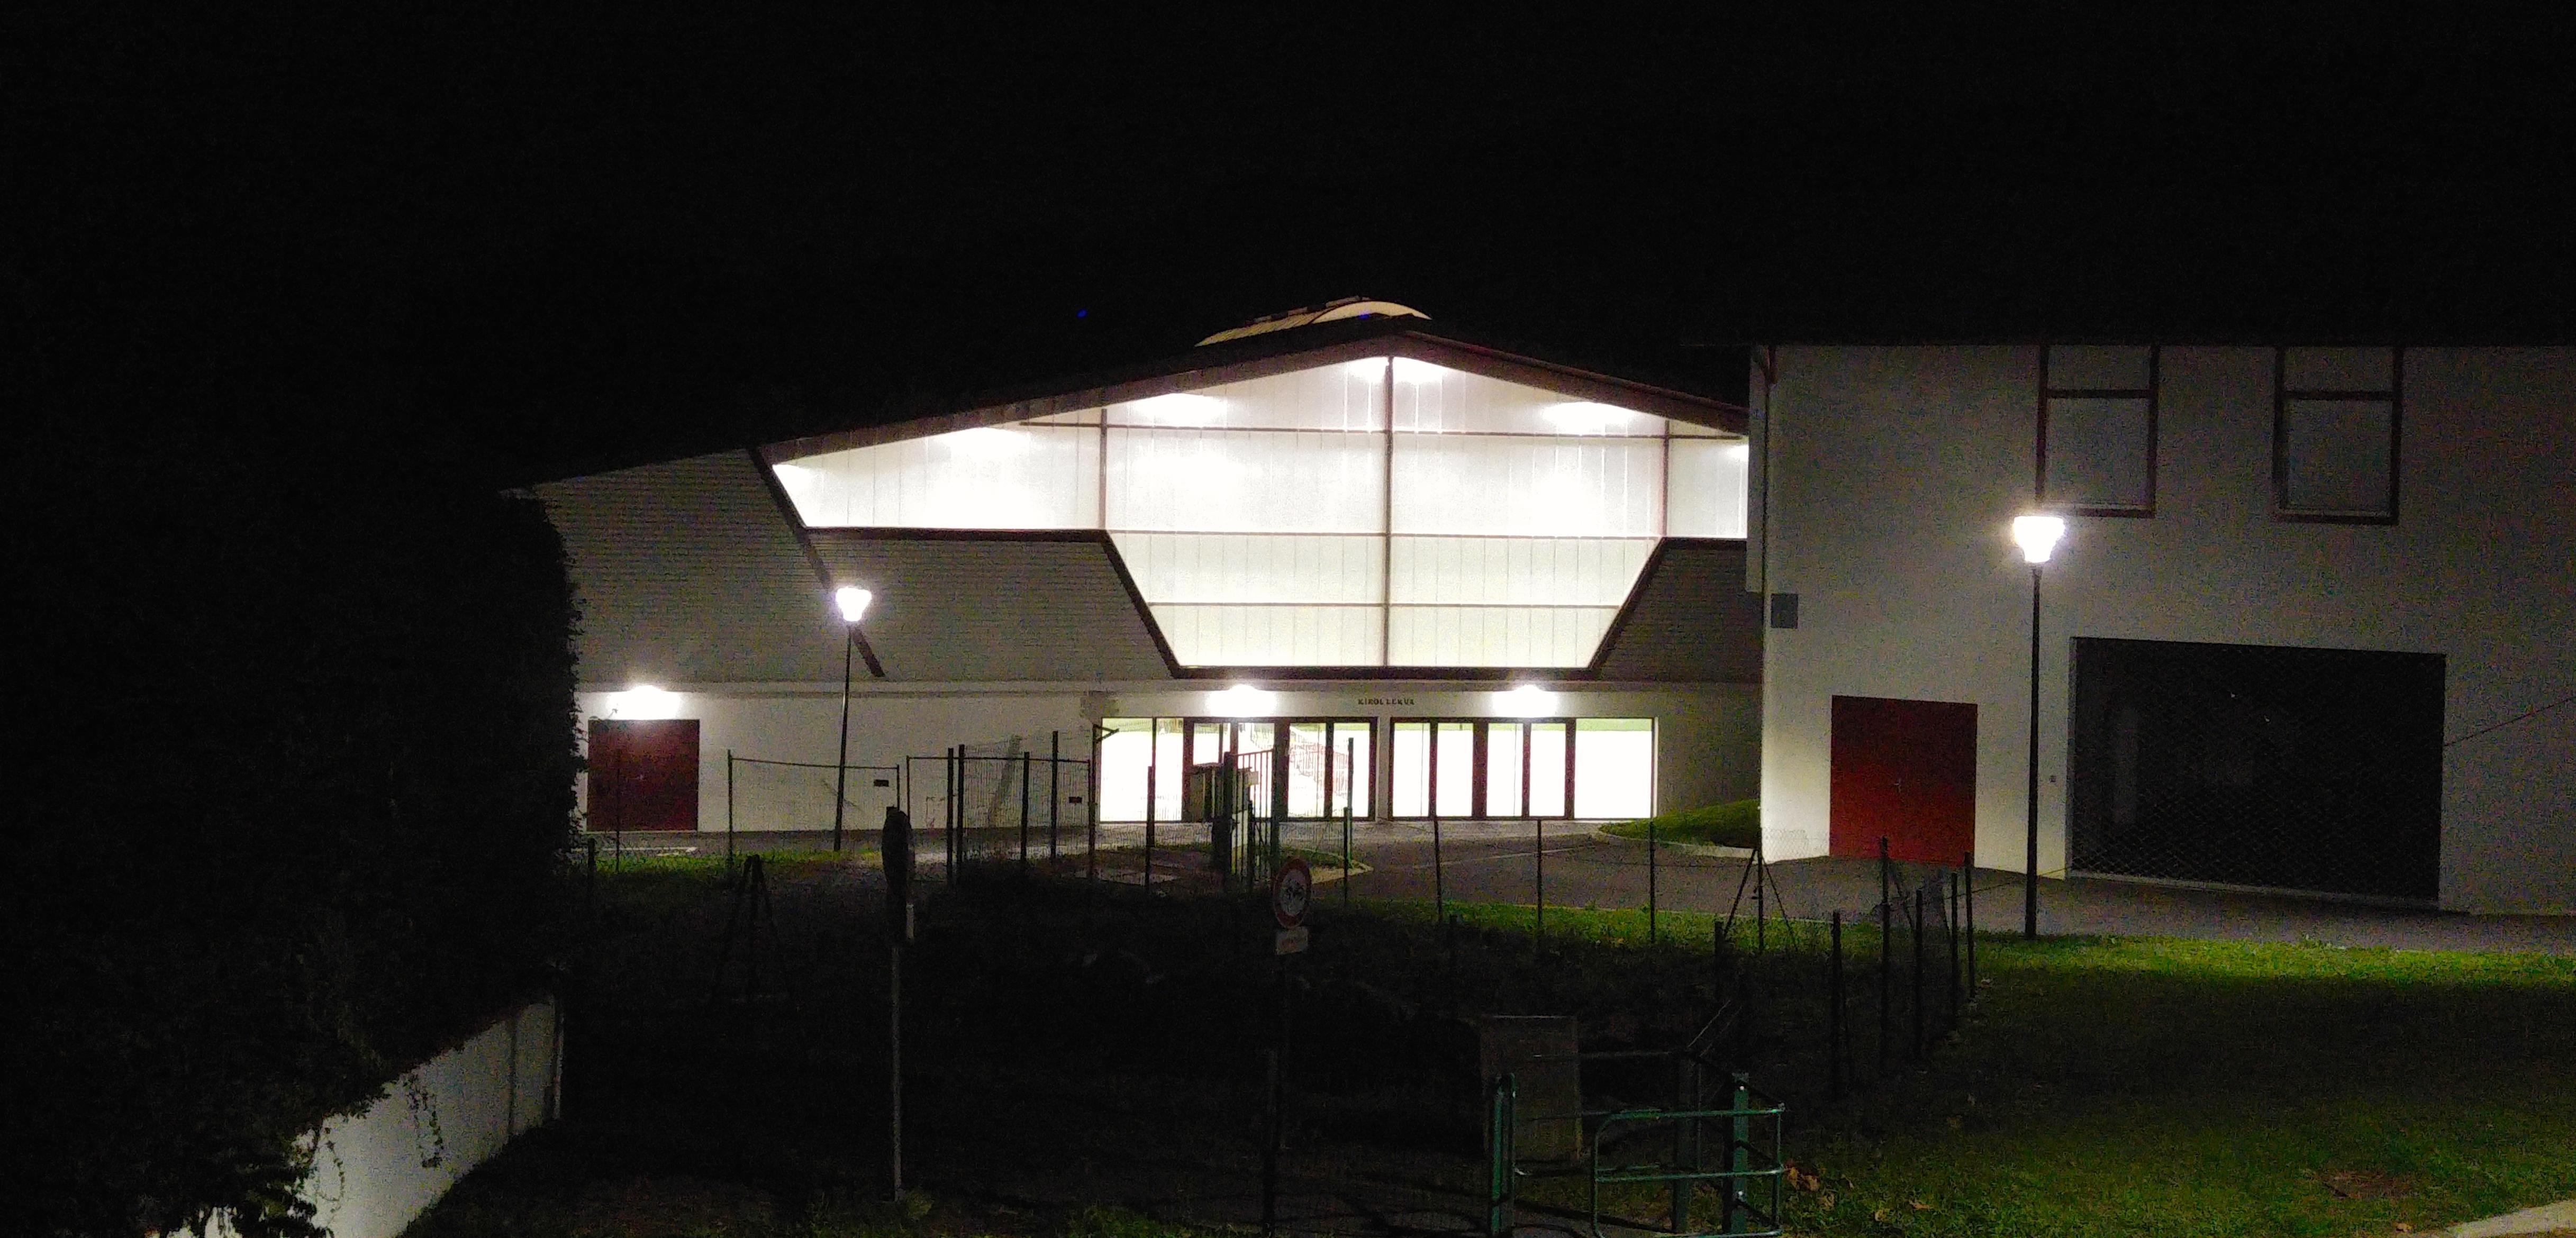 Salle, la nuit